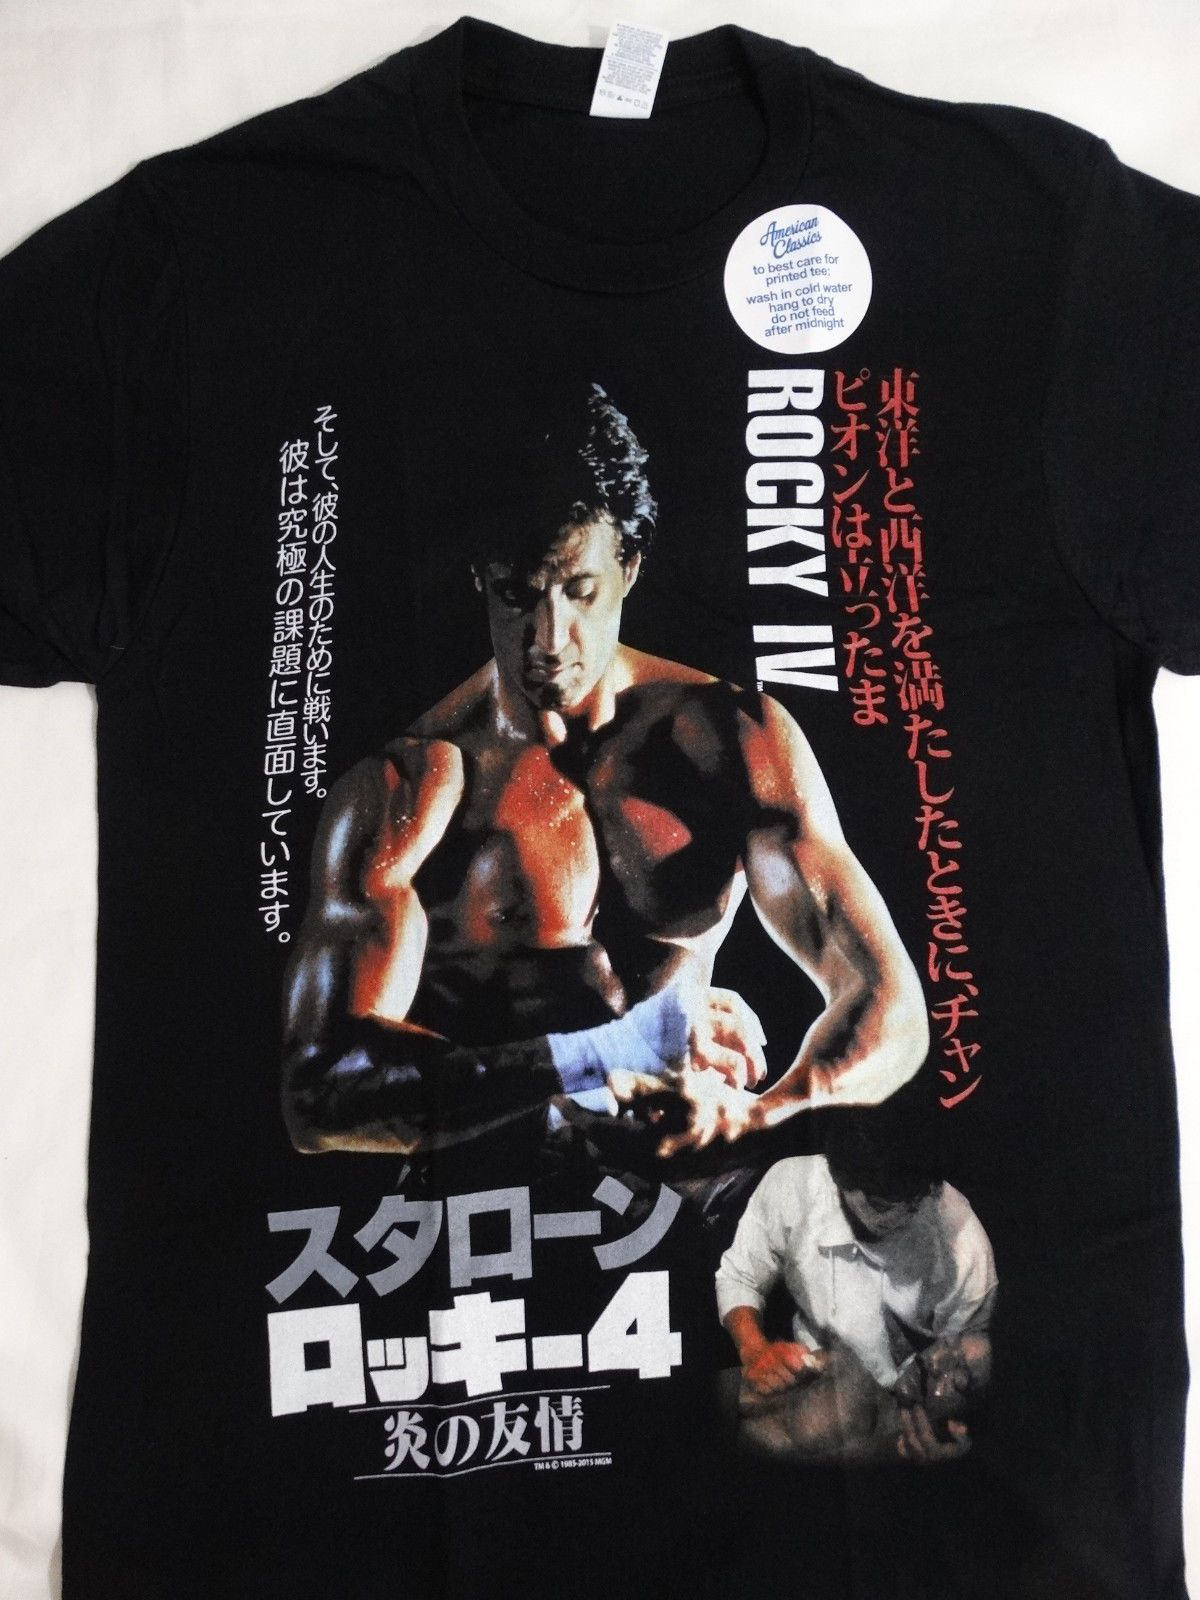 4 Bout Mens Movie T Shirt Drago // Balboa Rocky IV Lundgren // Stallone